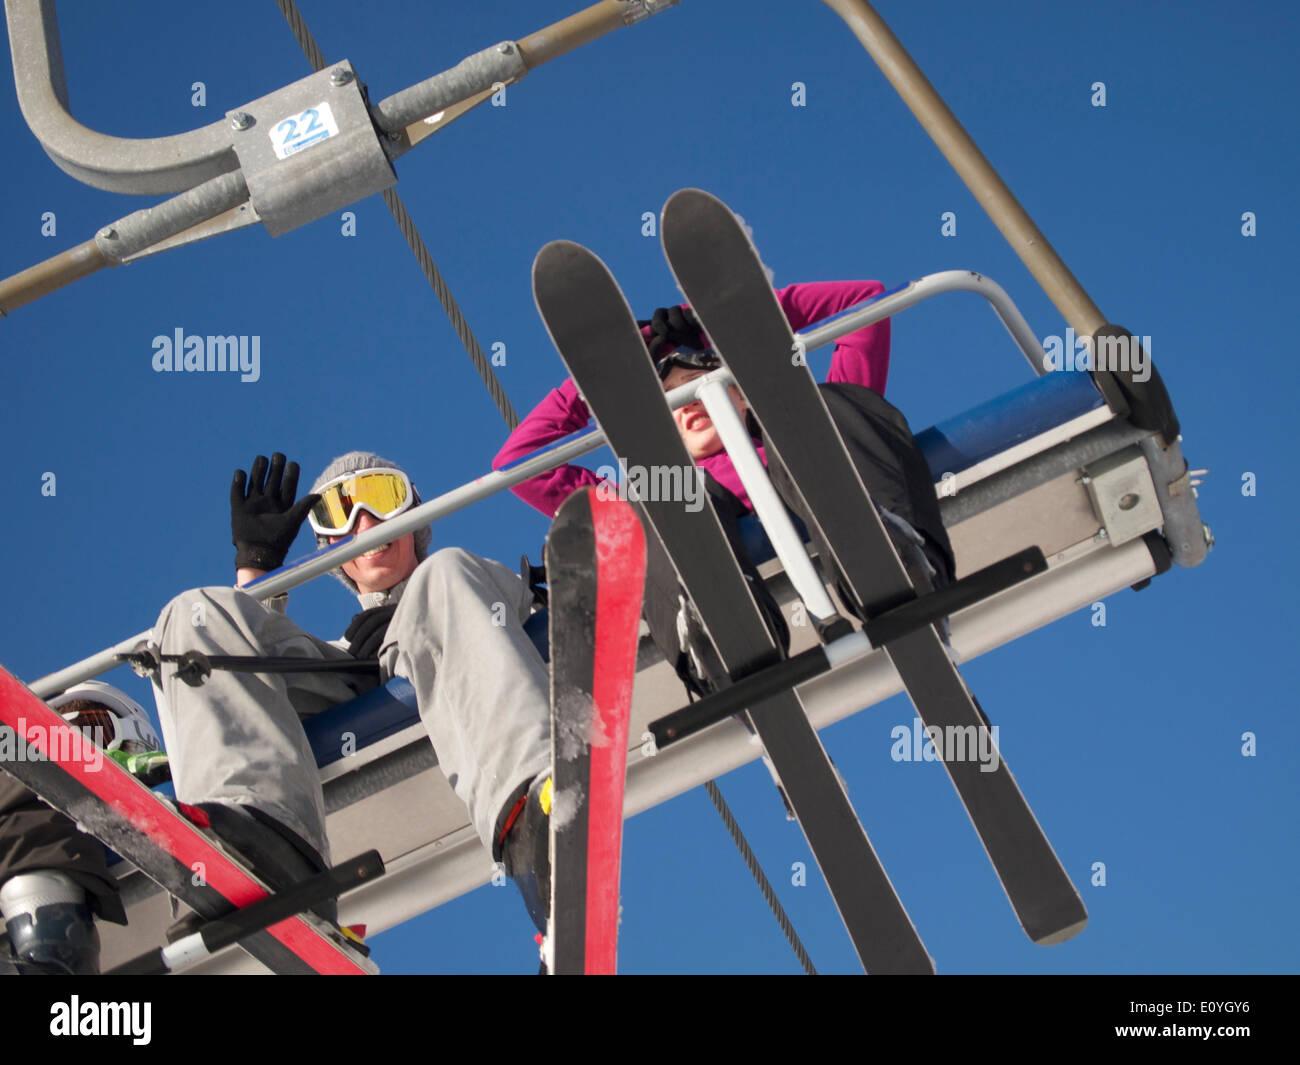 Skiers on a ski lift - Stock Image